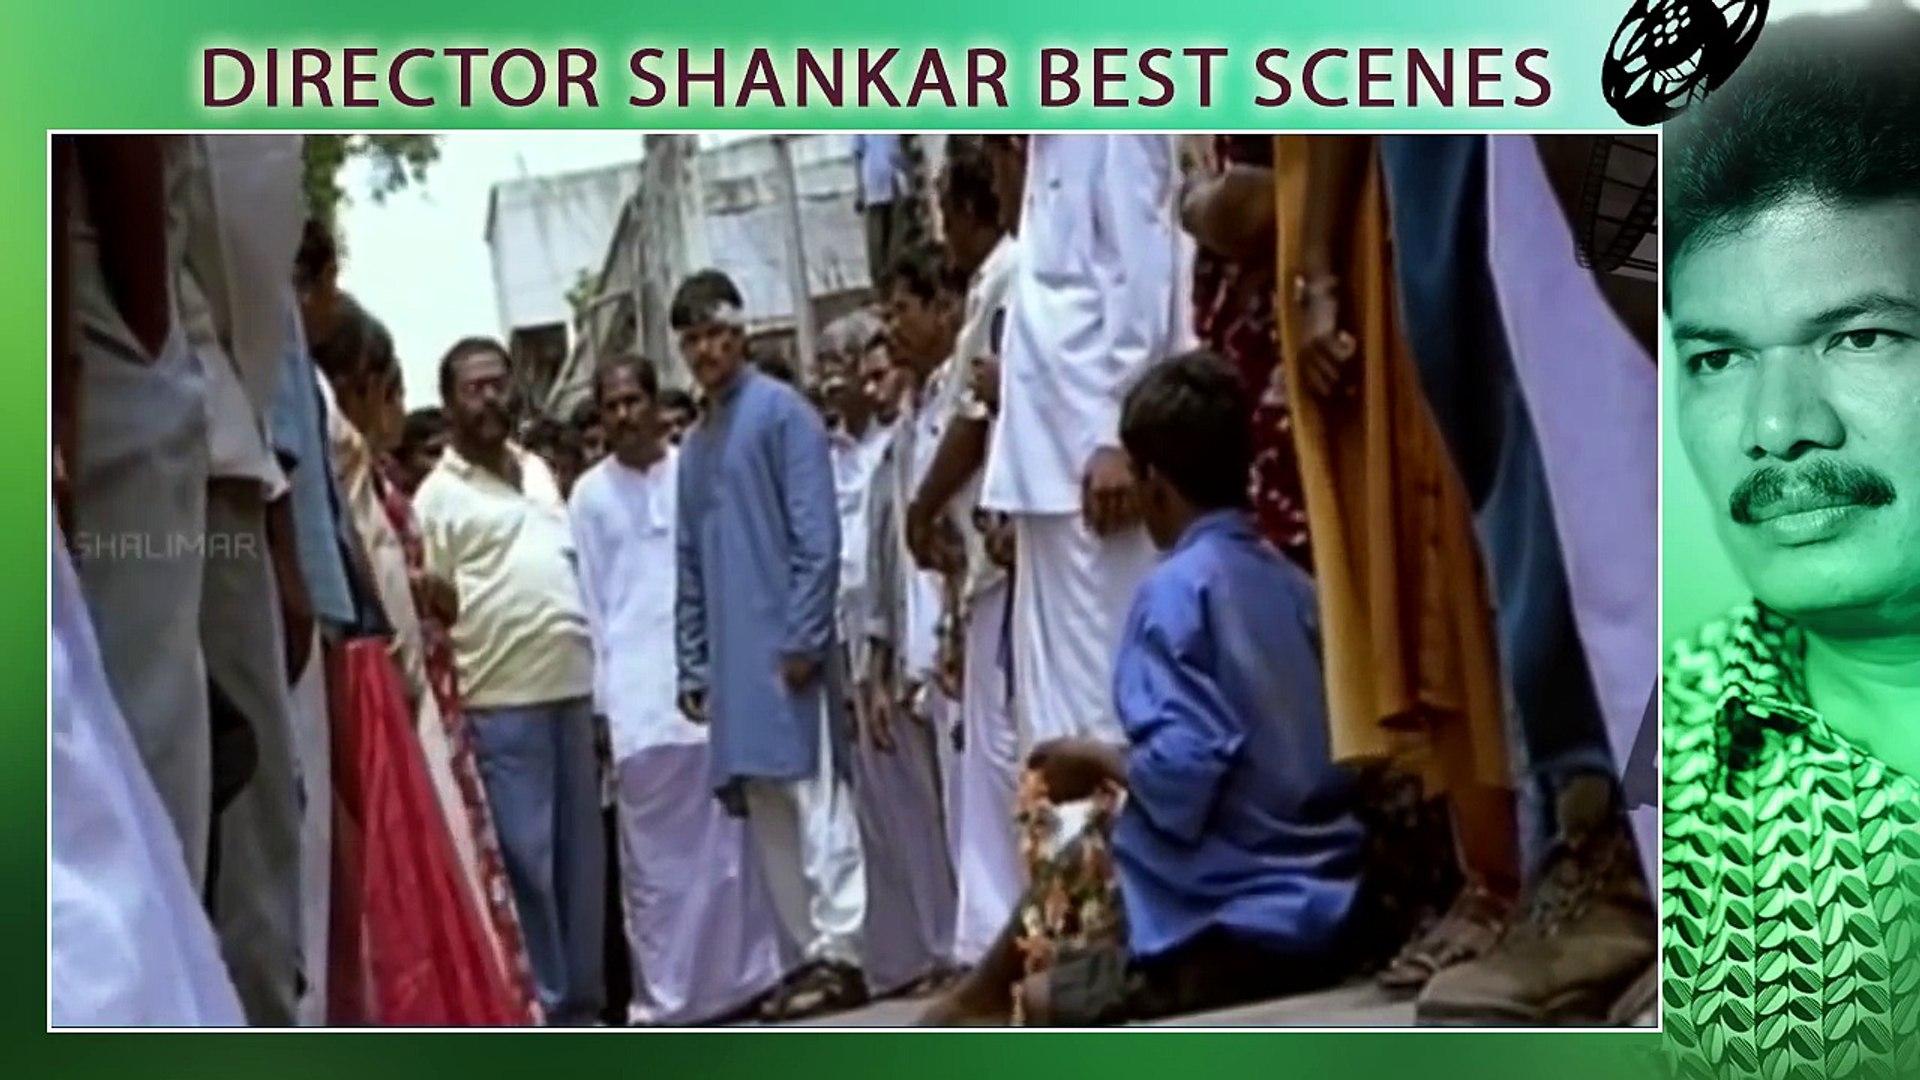 Director S. Shankar Best Scenes  Telugu Movies